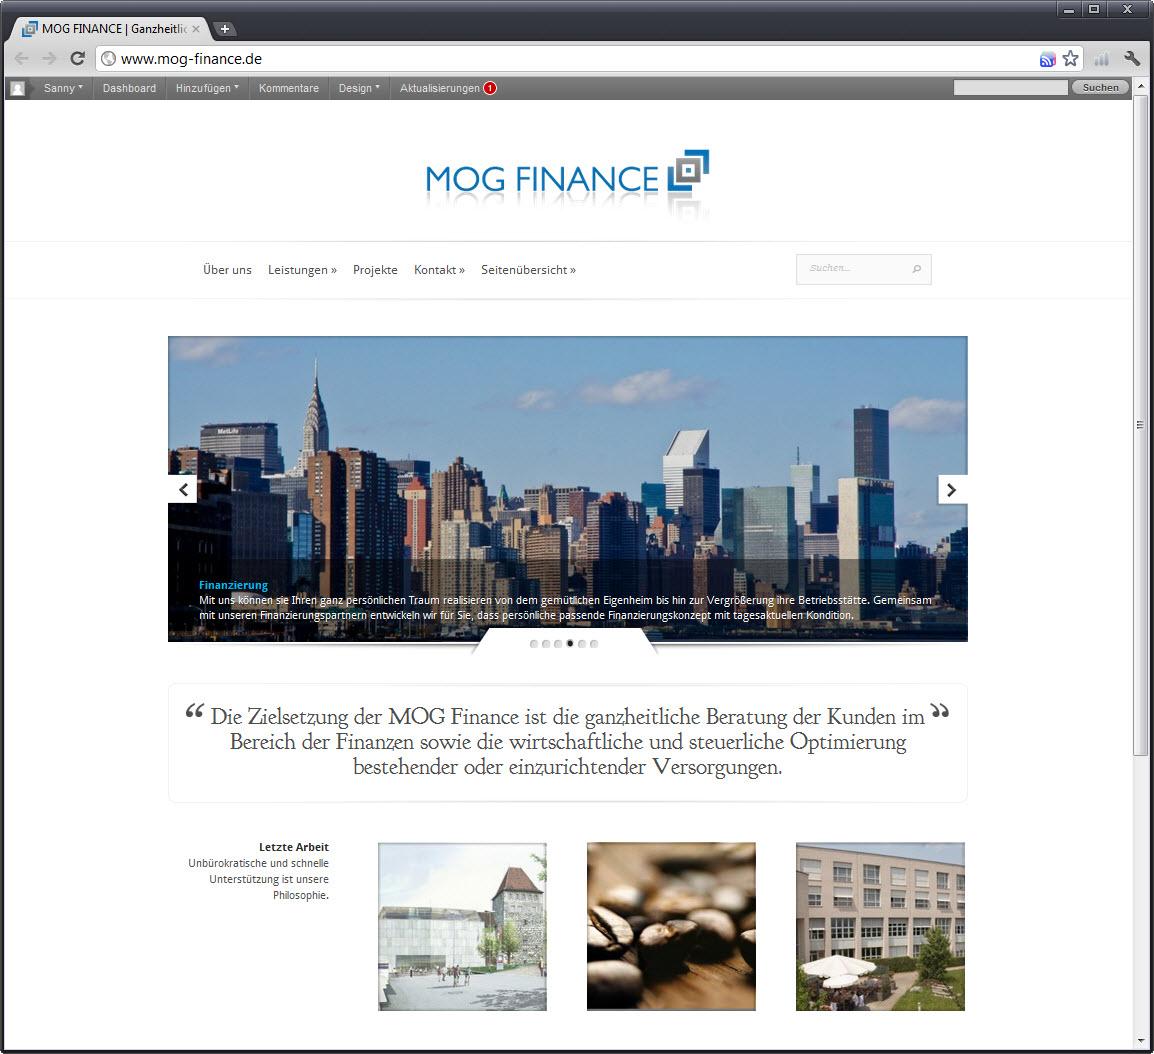 MOG FINANCE Website